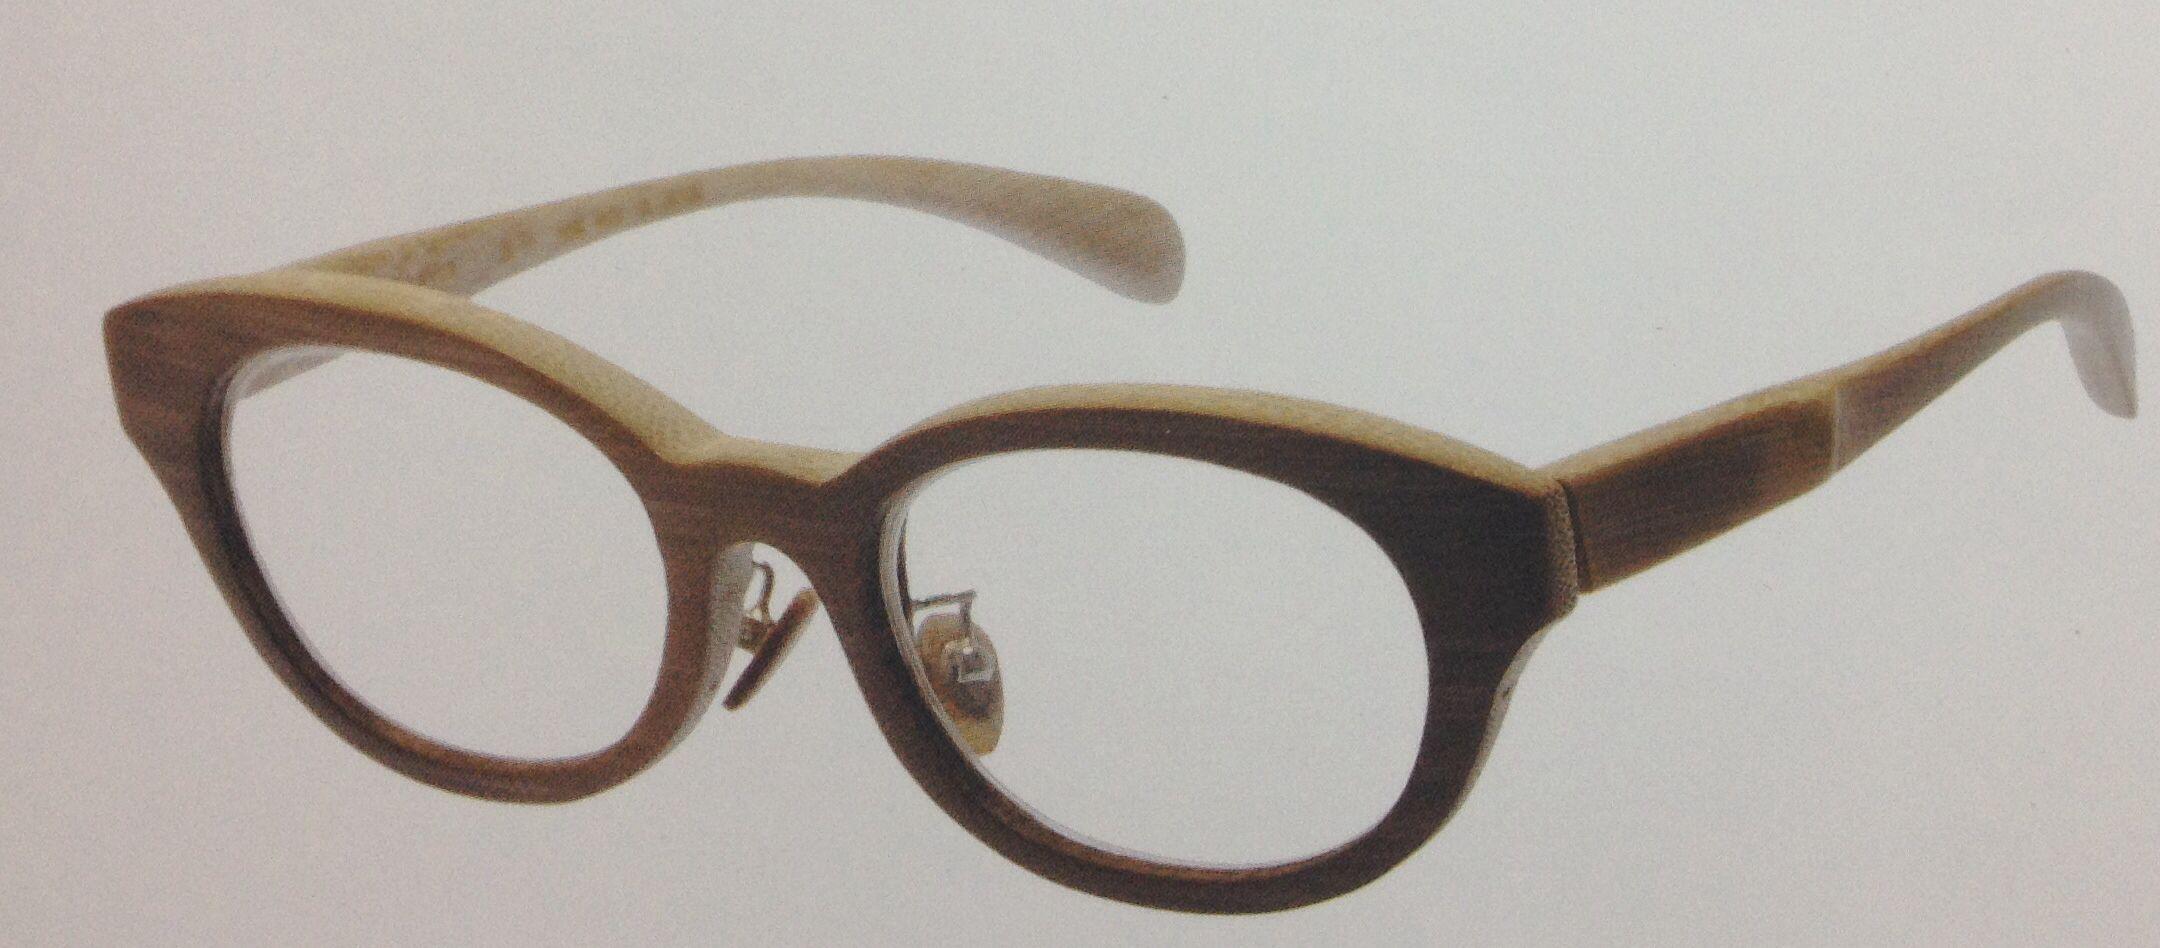 Eyewear Frames From Japan : glasses from japan eyewear Pinterest